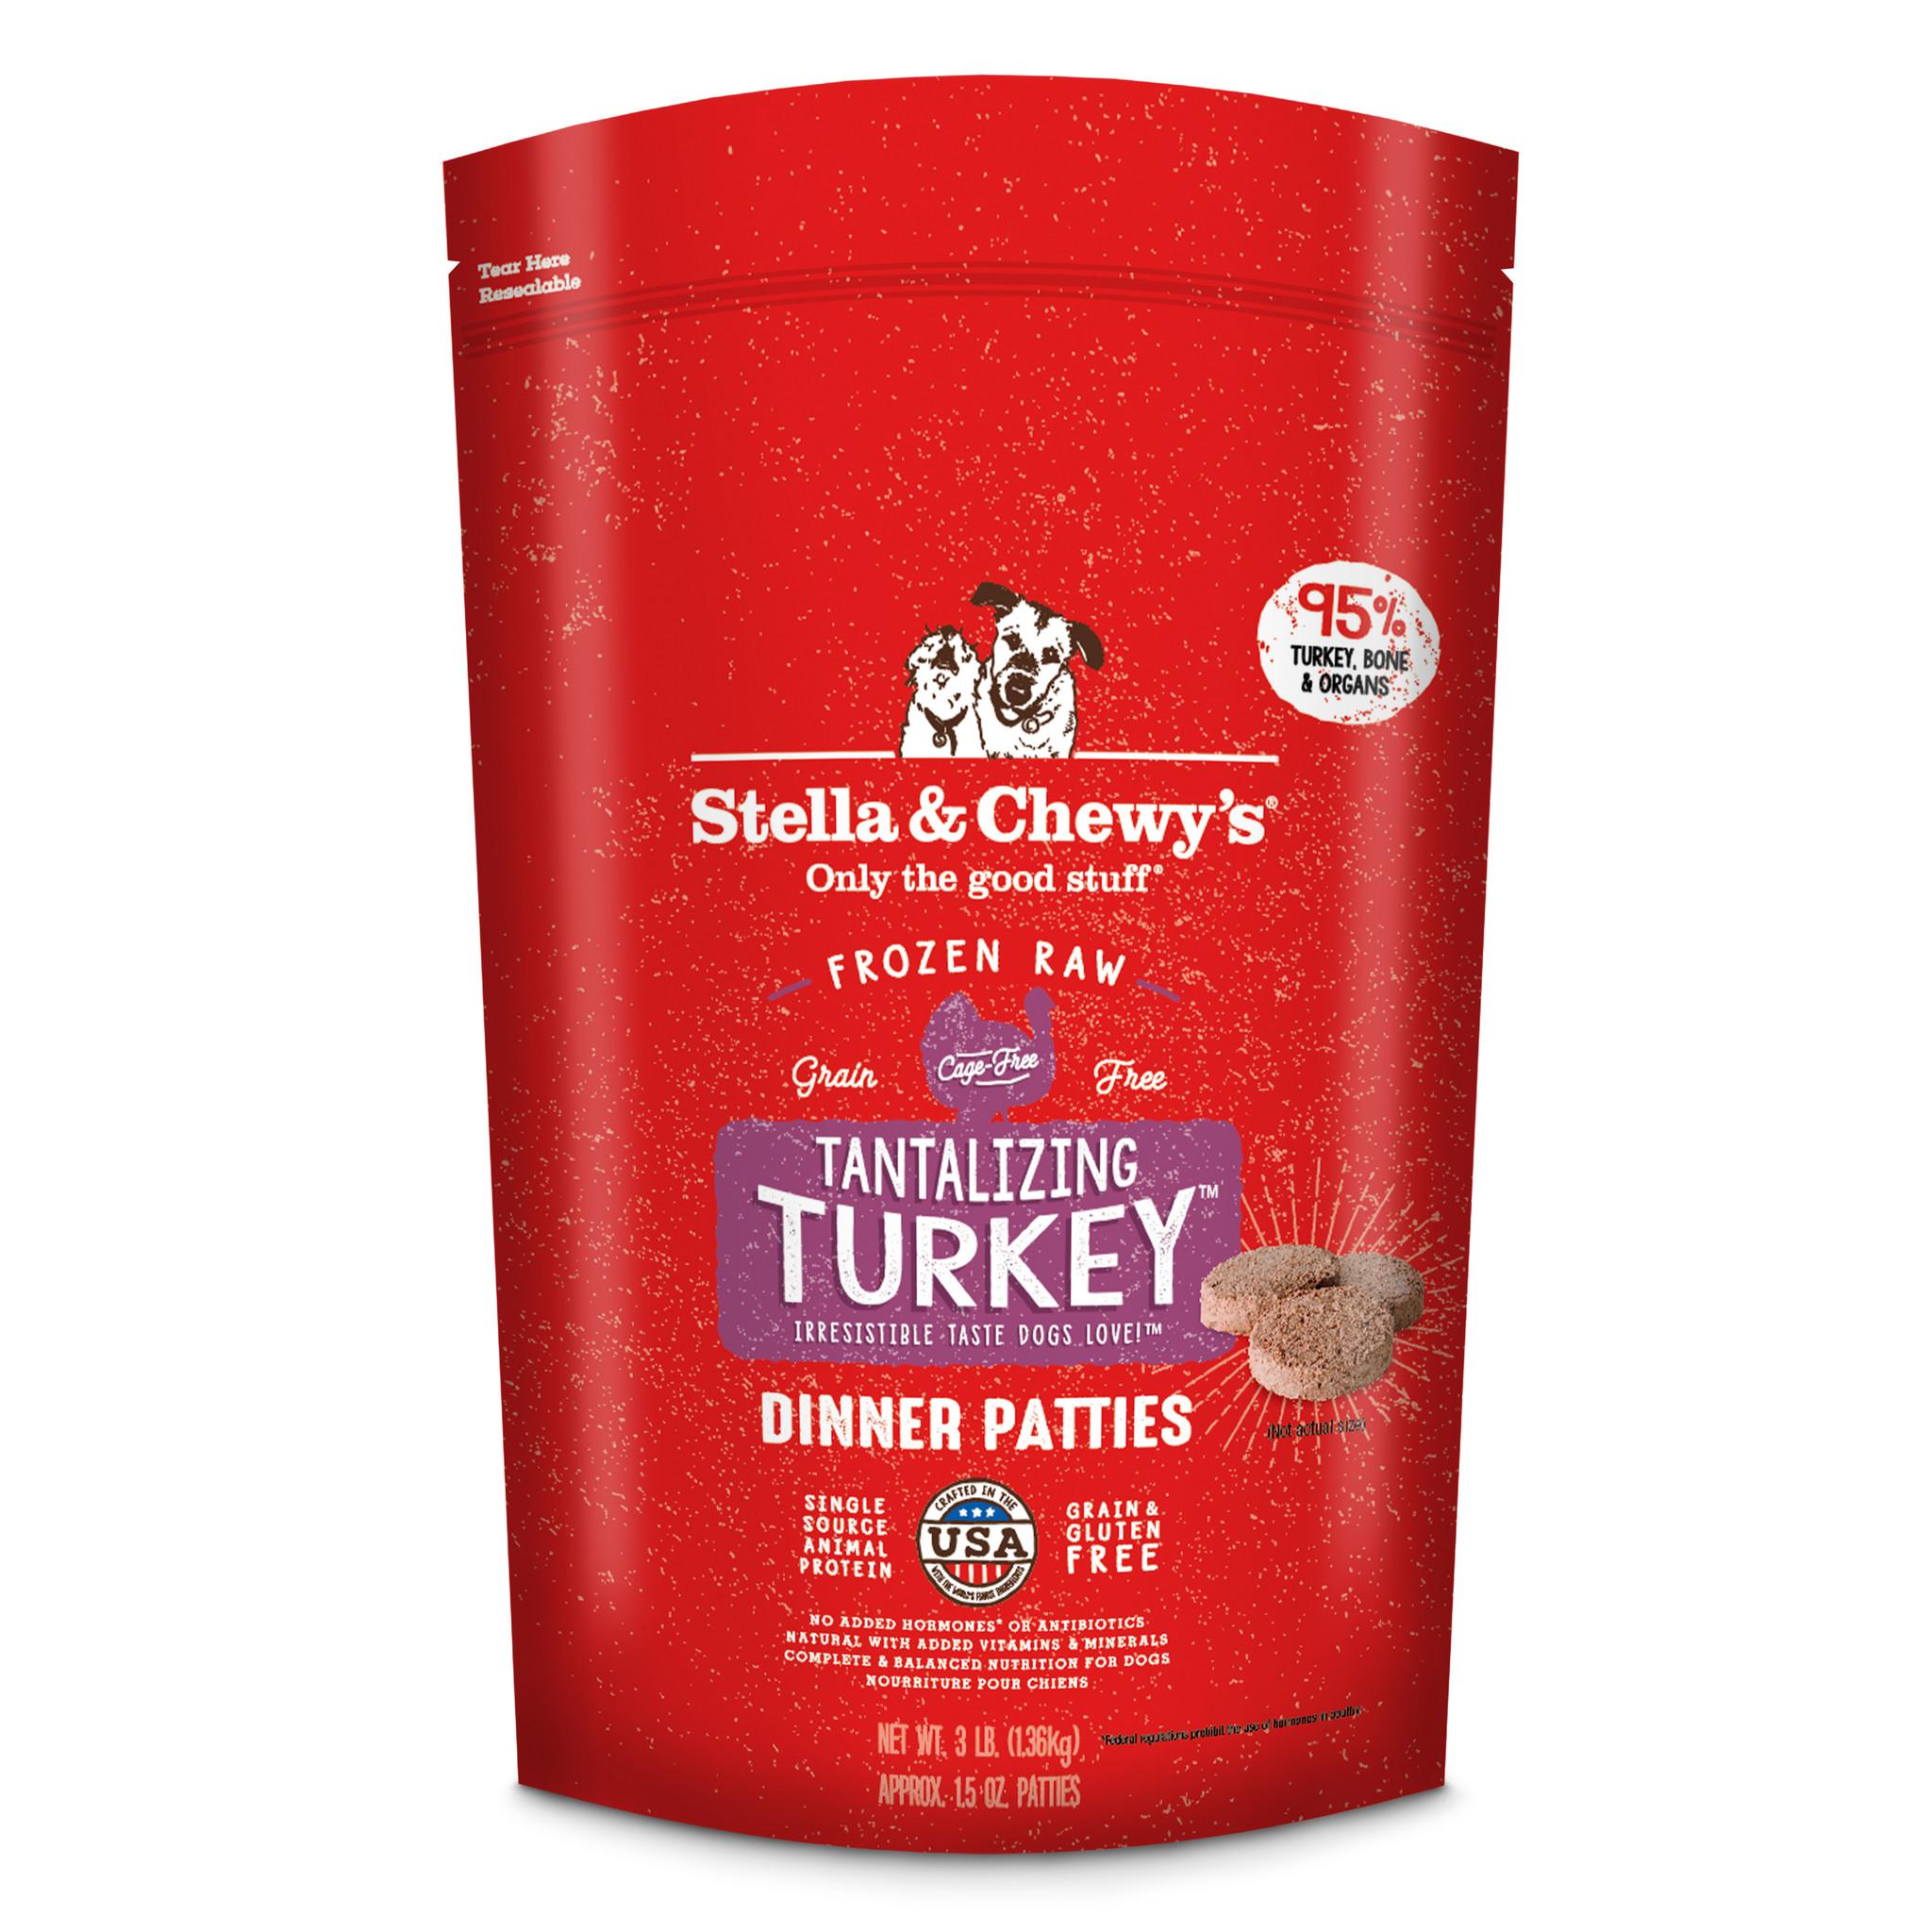 Stella & Chewys Stella & Chewys Tantalizing Turkey Frozen Raw Dinner Patties